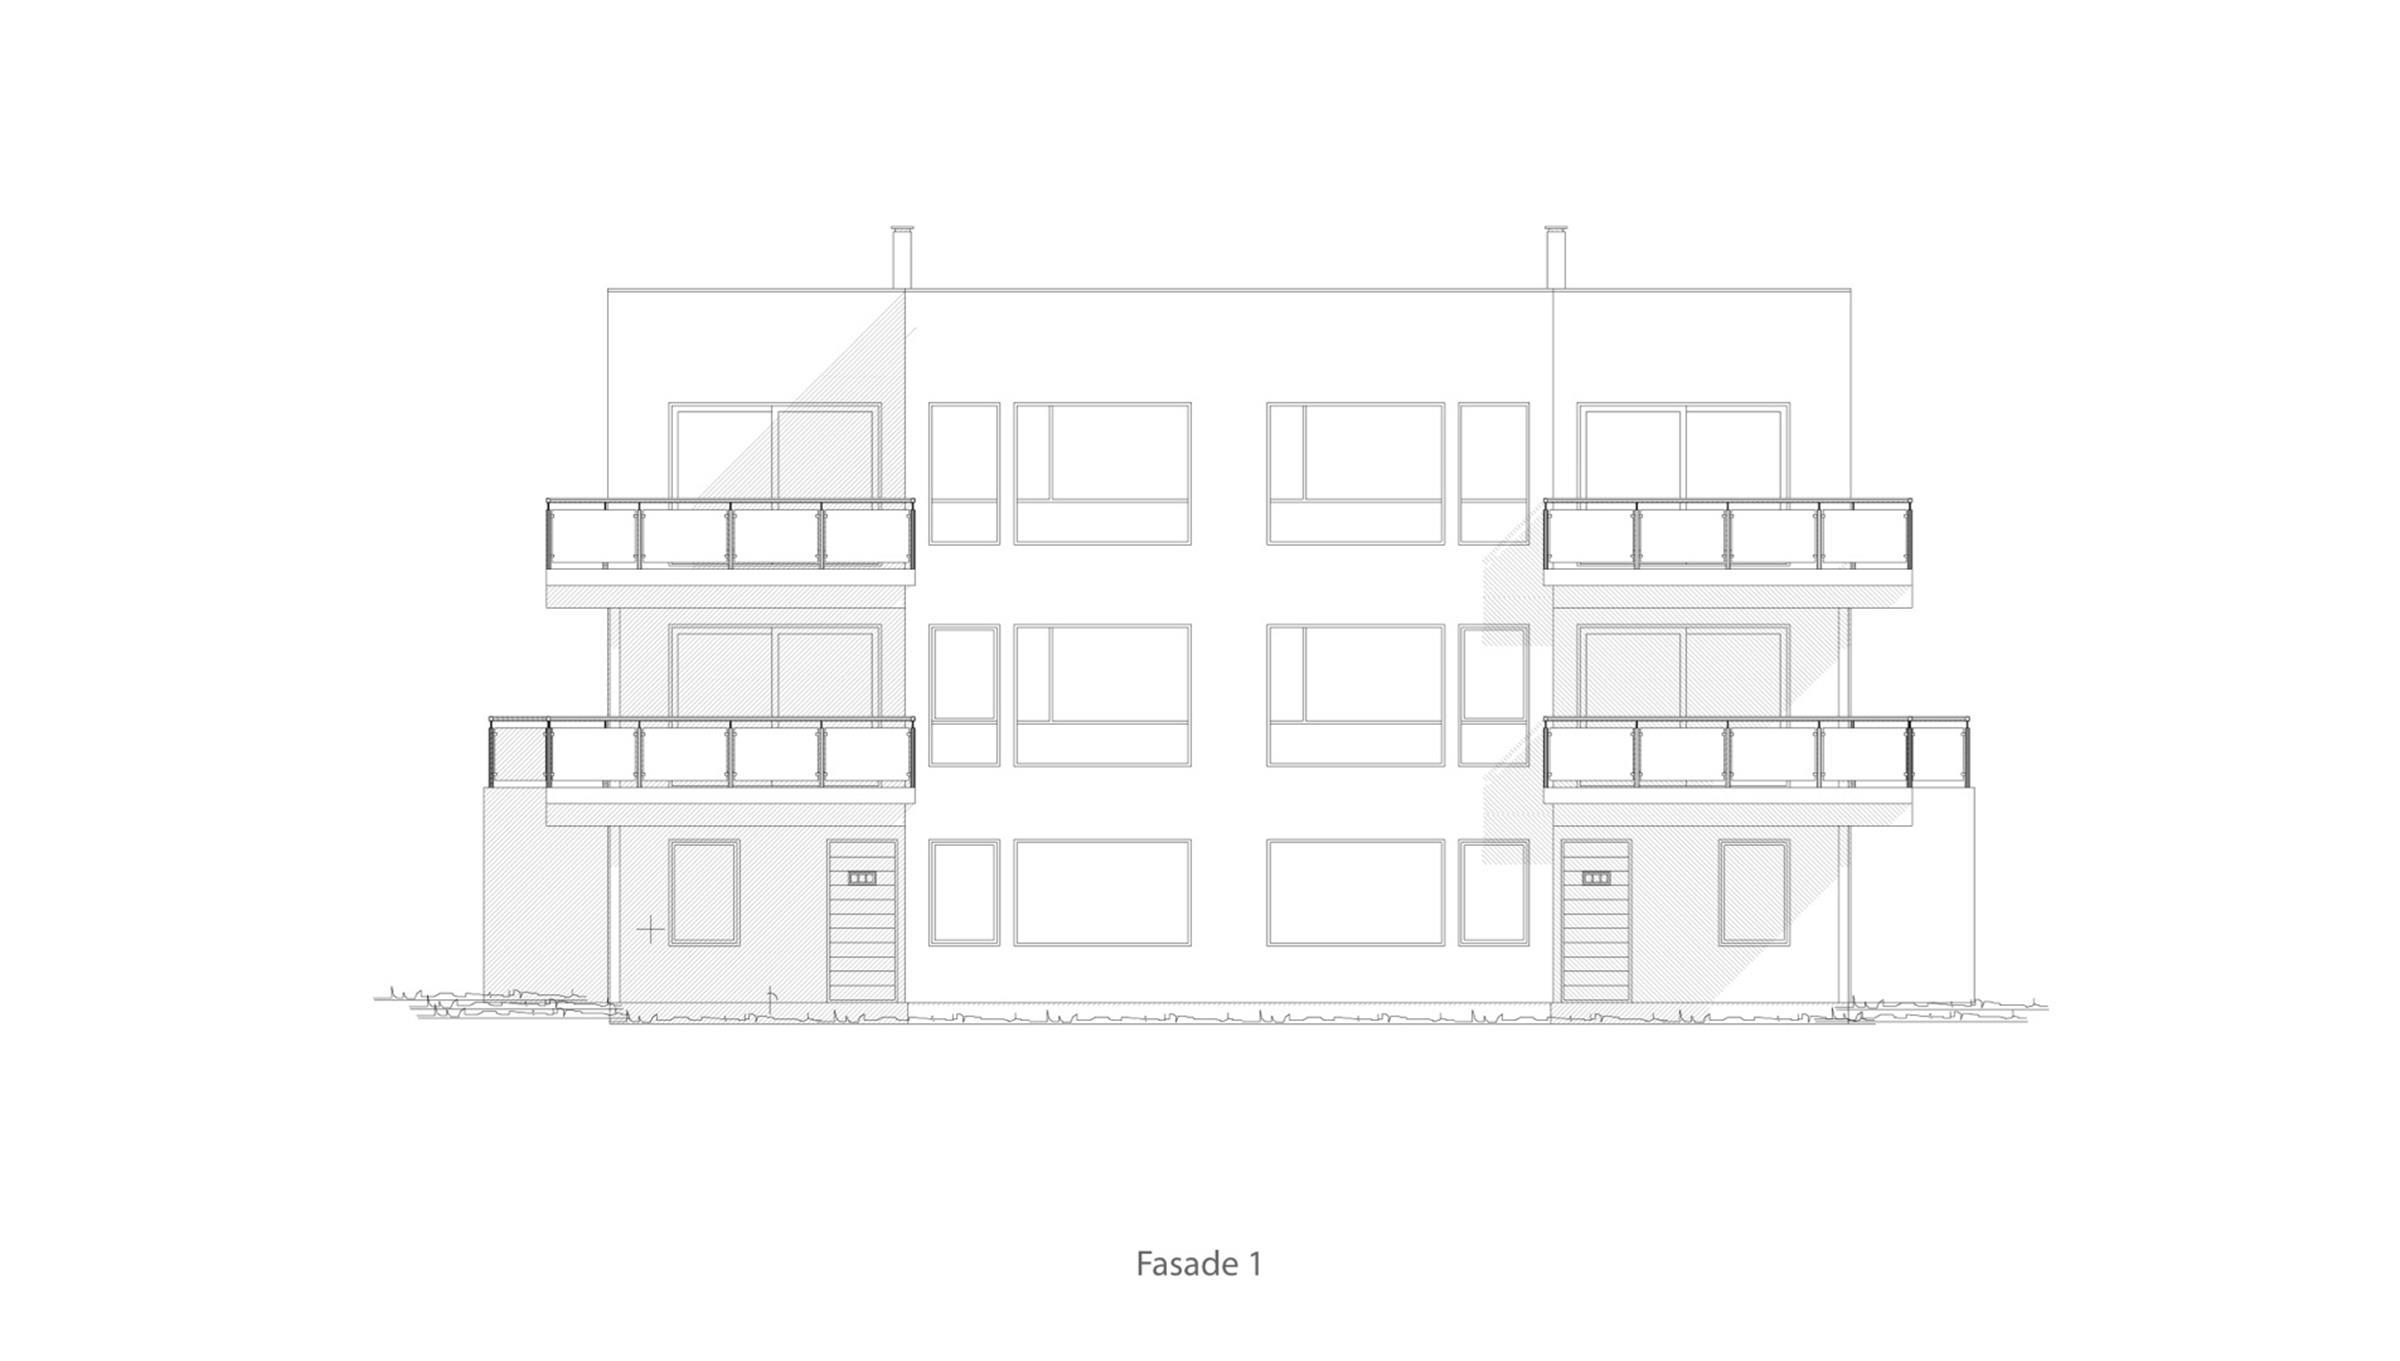 Drammen fasade 1